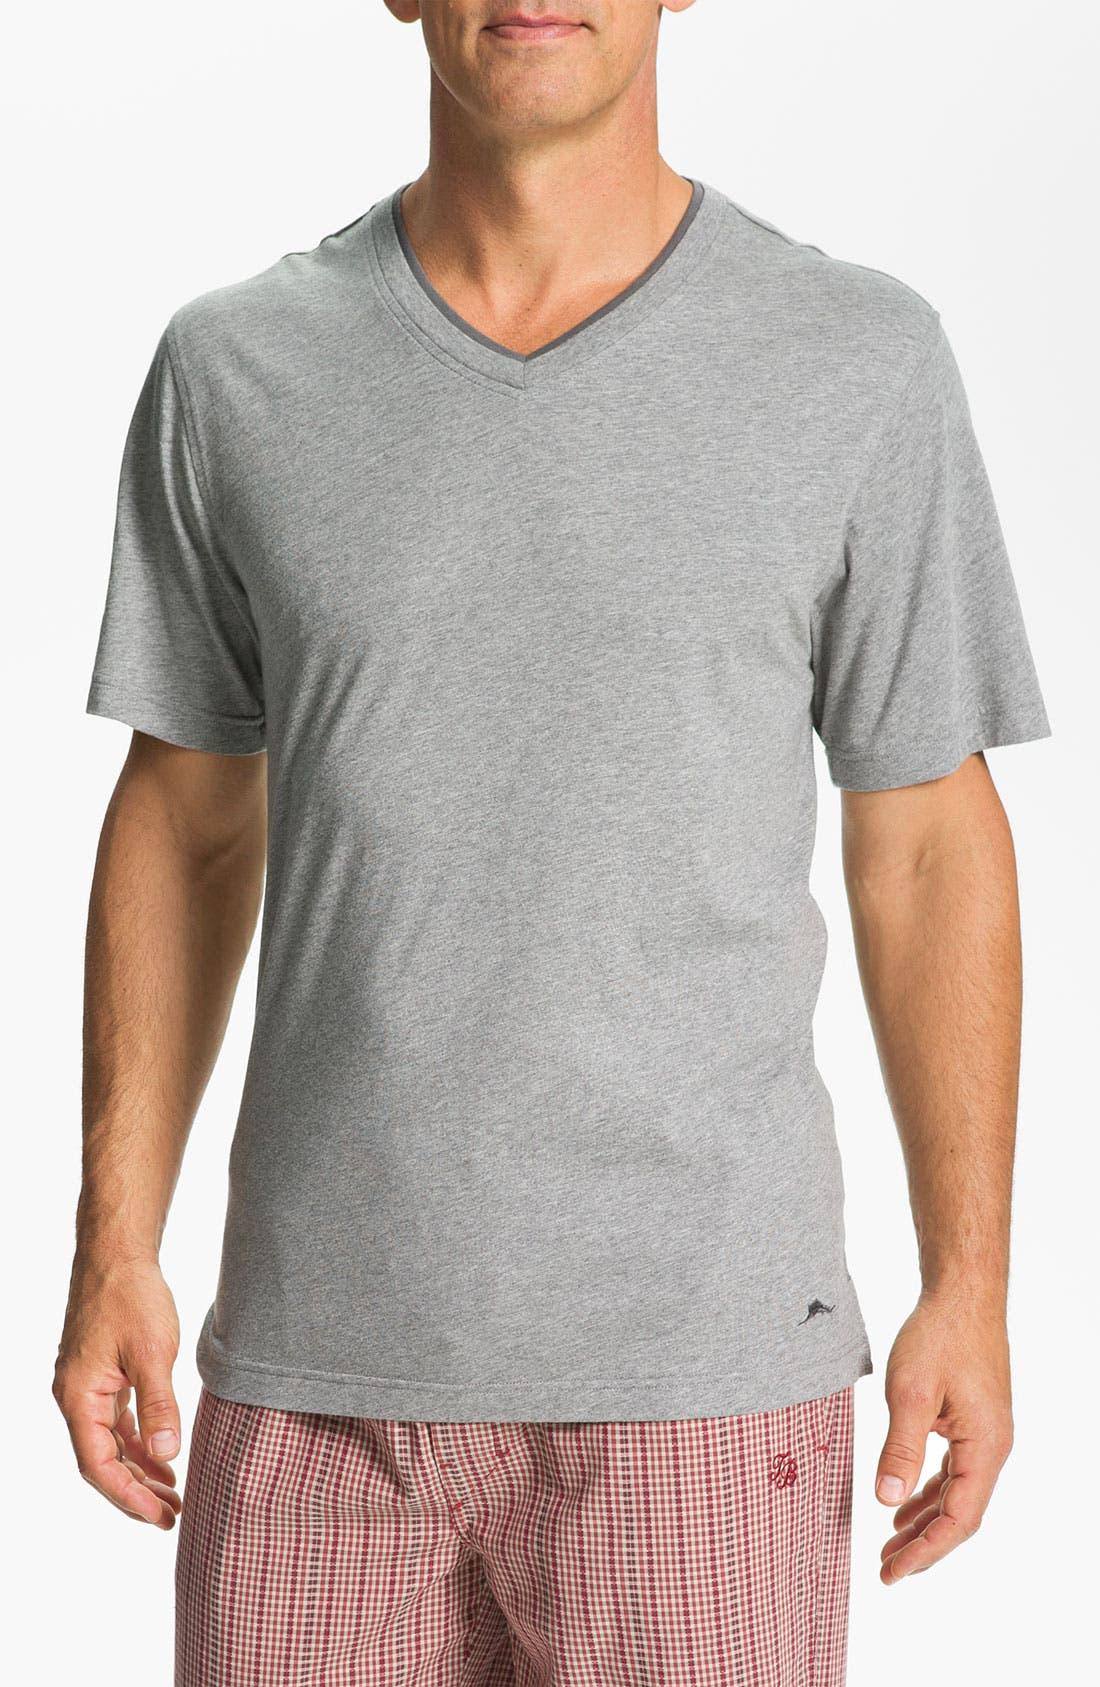 Main Image - Tommy Bahama V-Neck T-Shirt